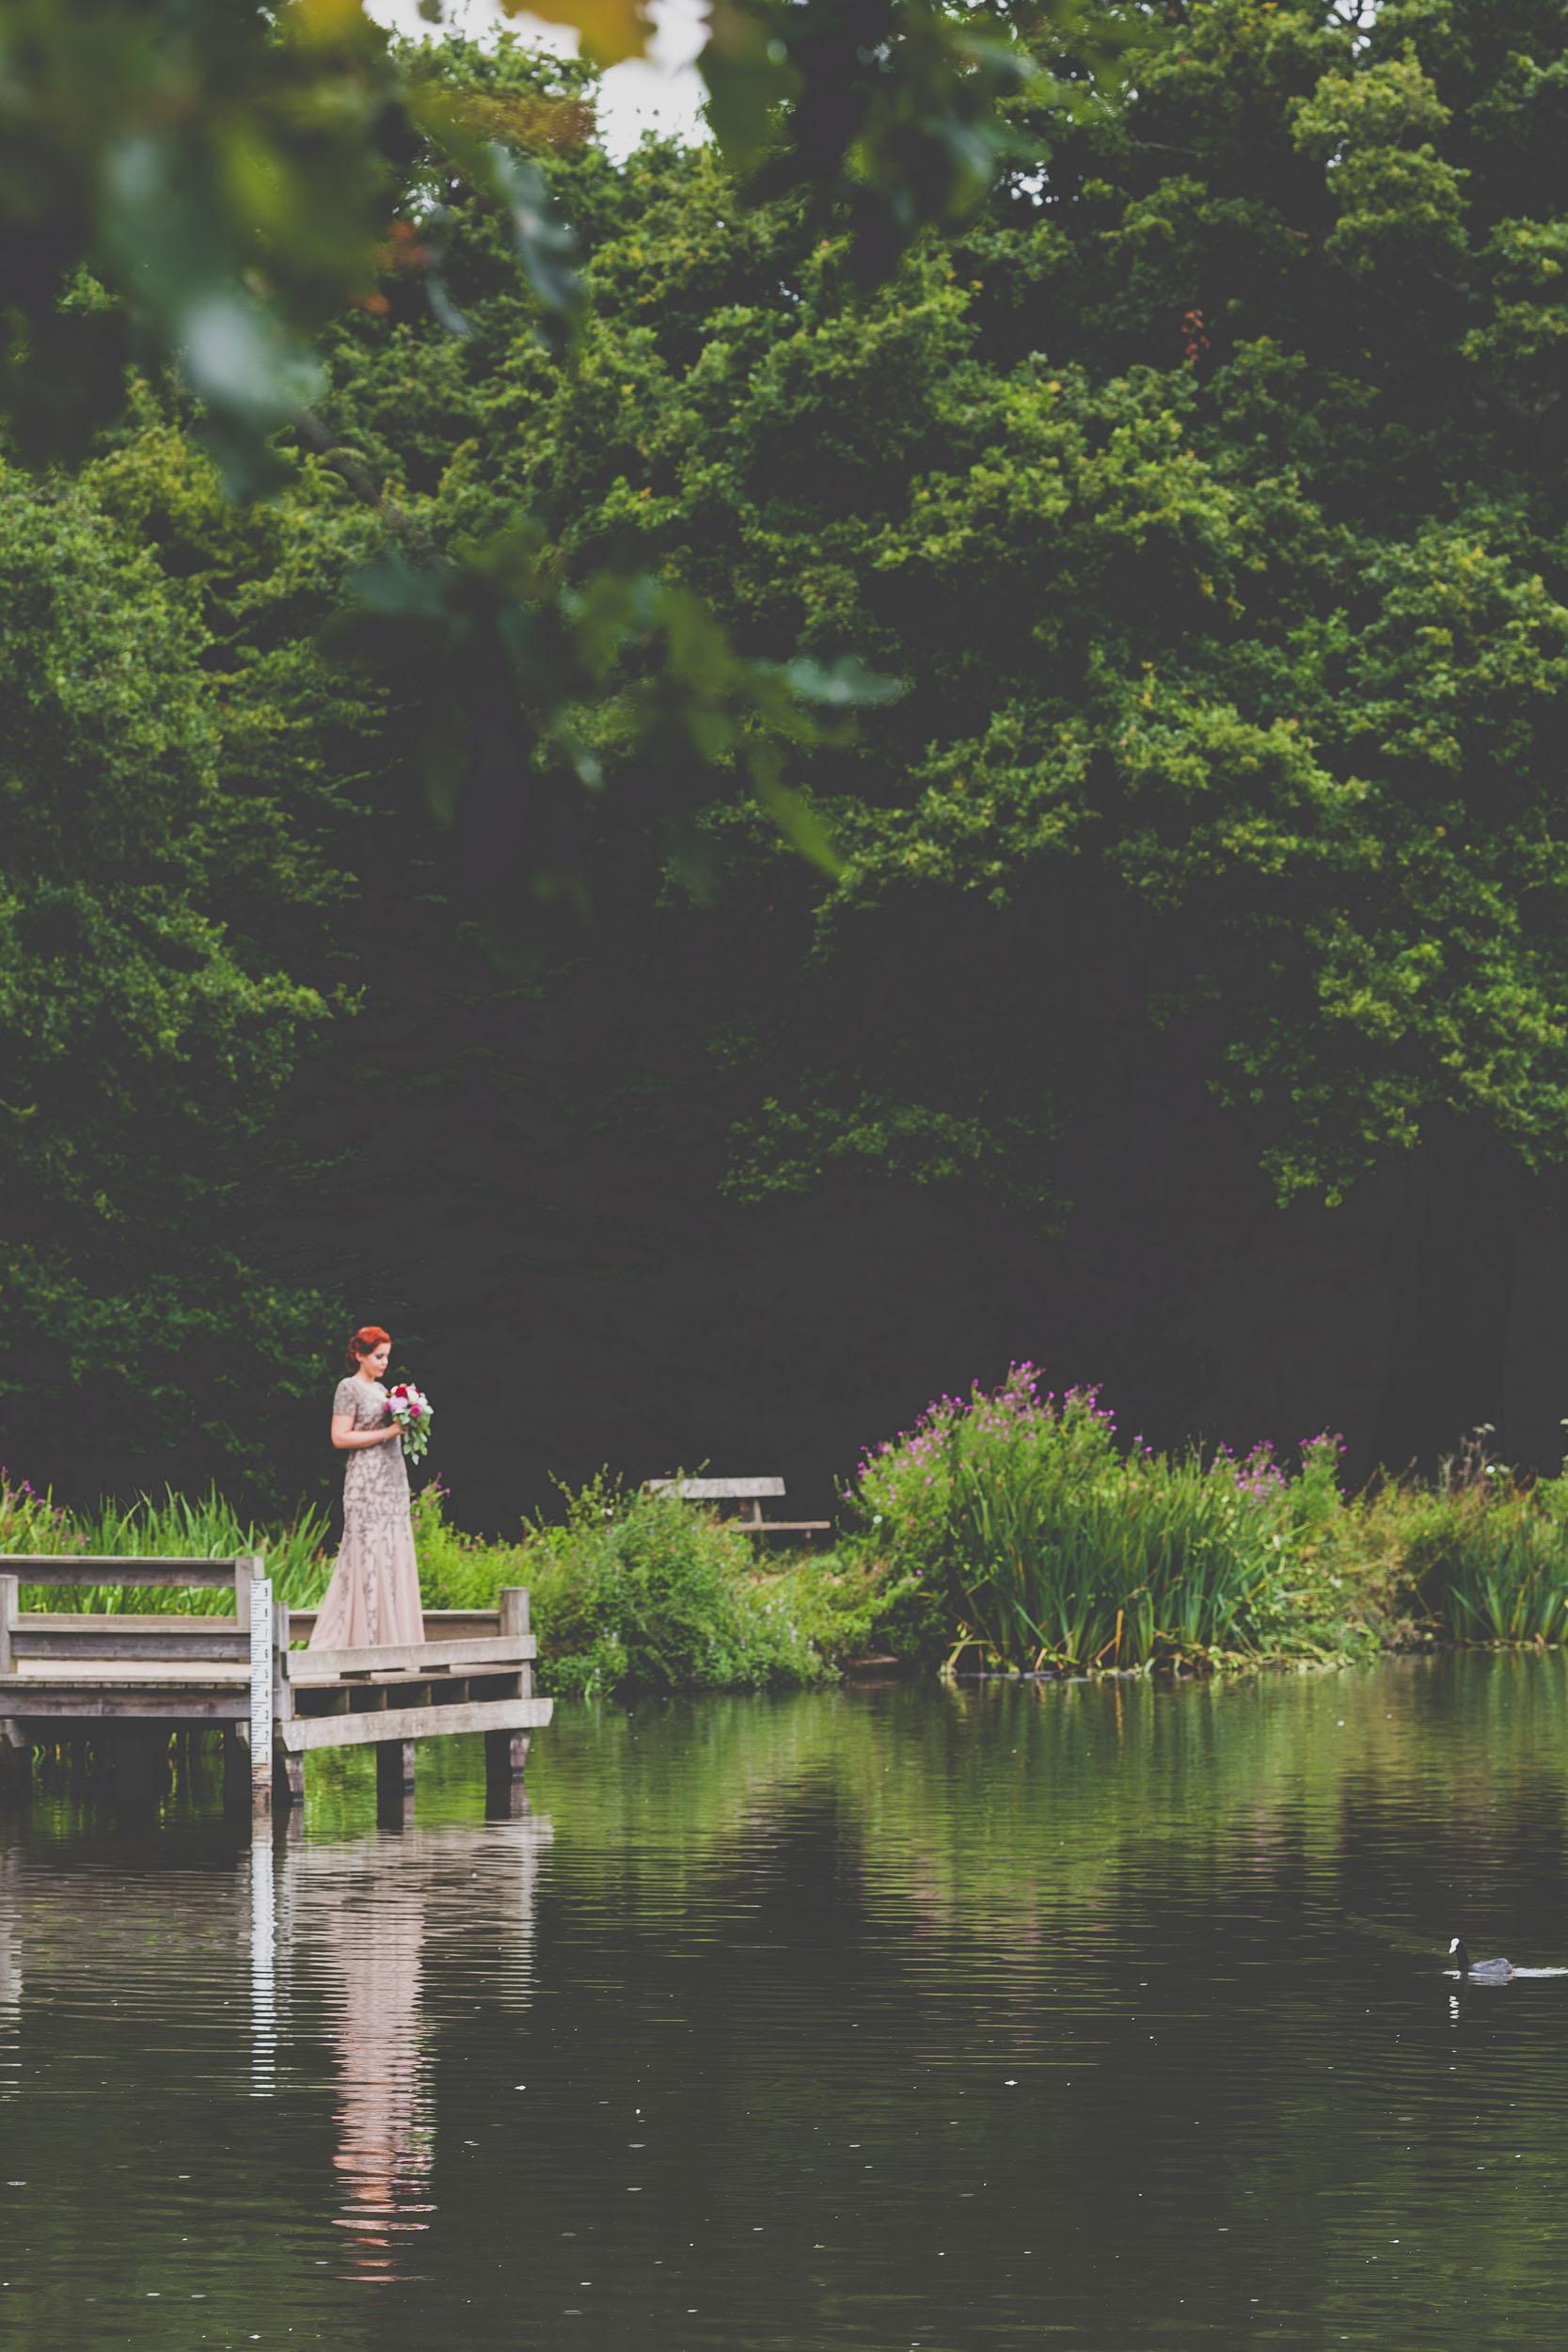 queen-elizabeths-hunting-lodge-epping-forest-wedding265.jpg